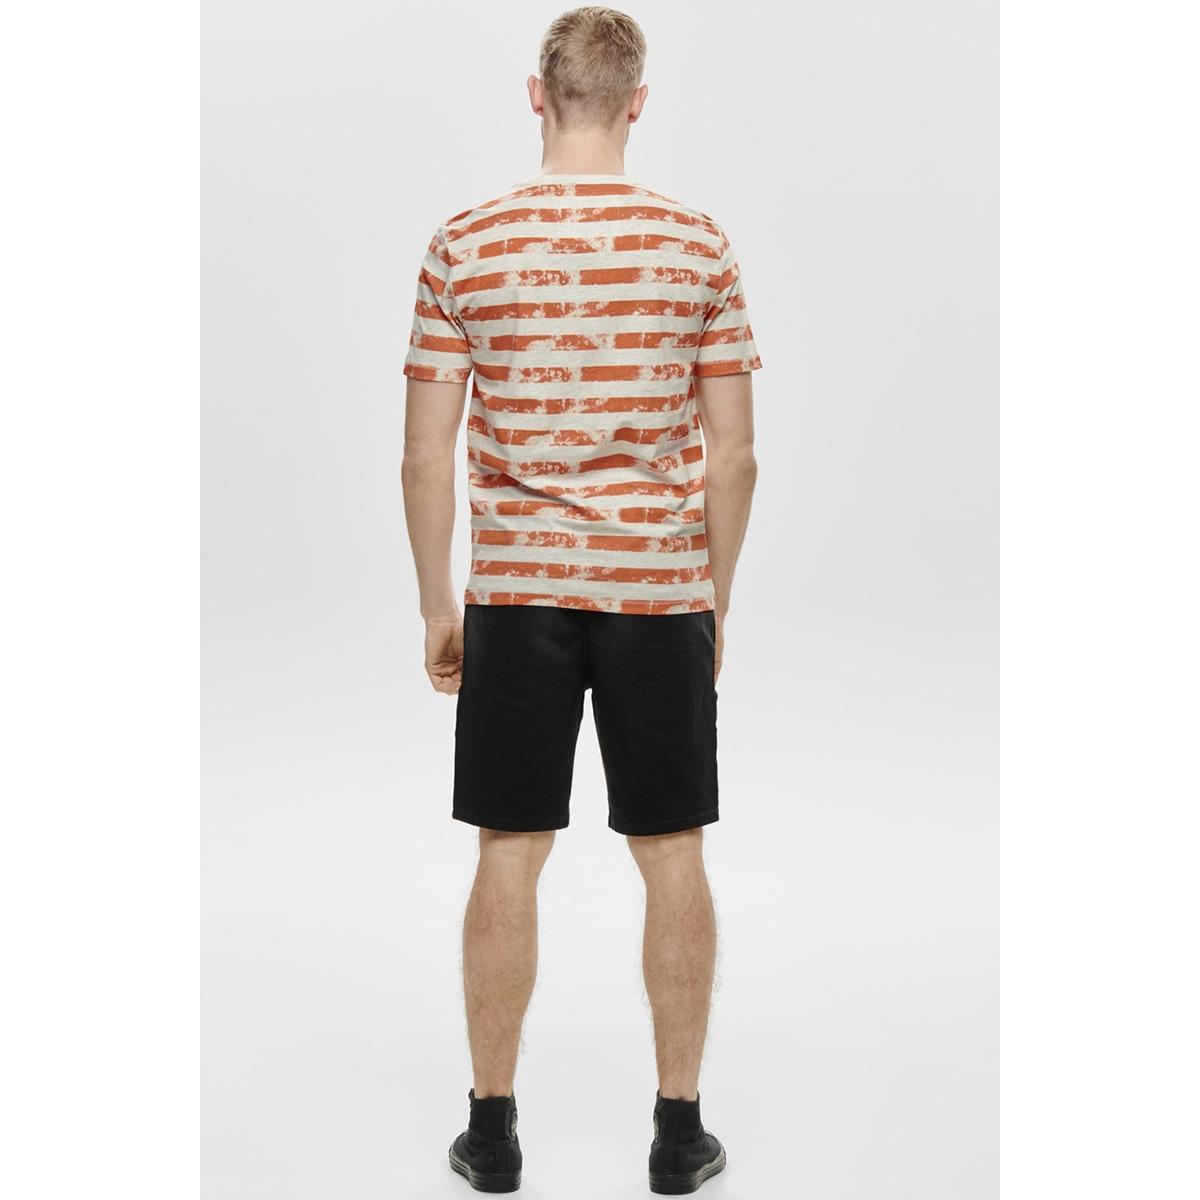 onspatrik stripe slim tee eq 3191 22013191 only & sons t-shirt carnelian